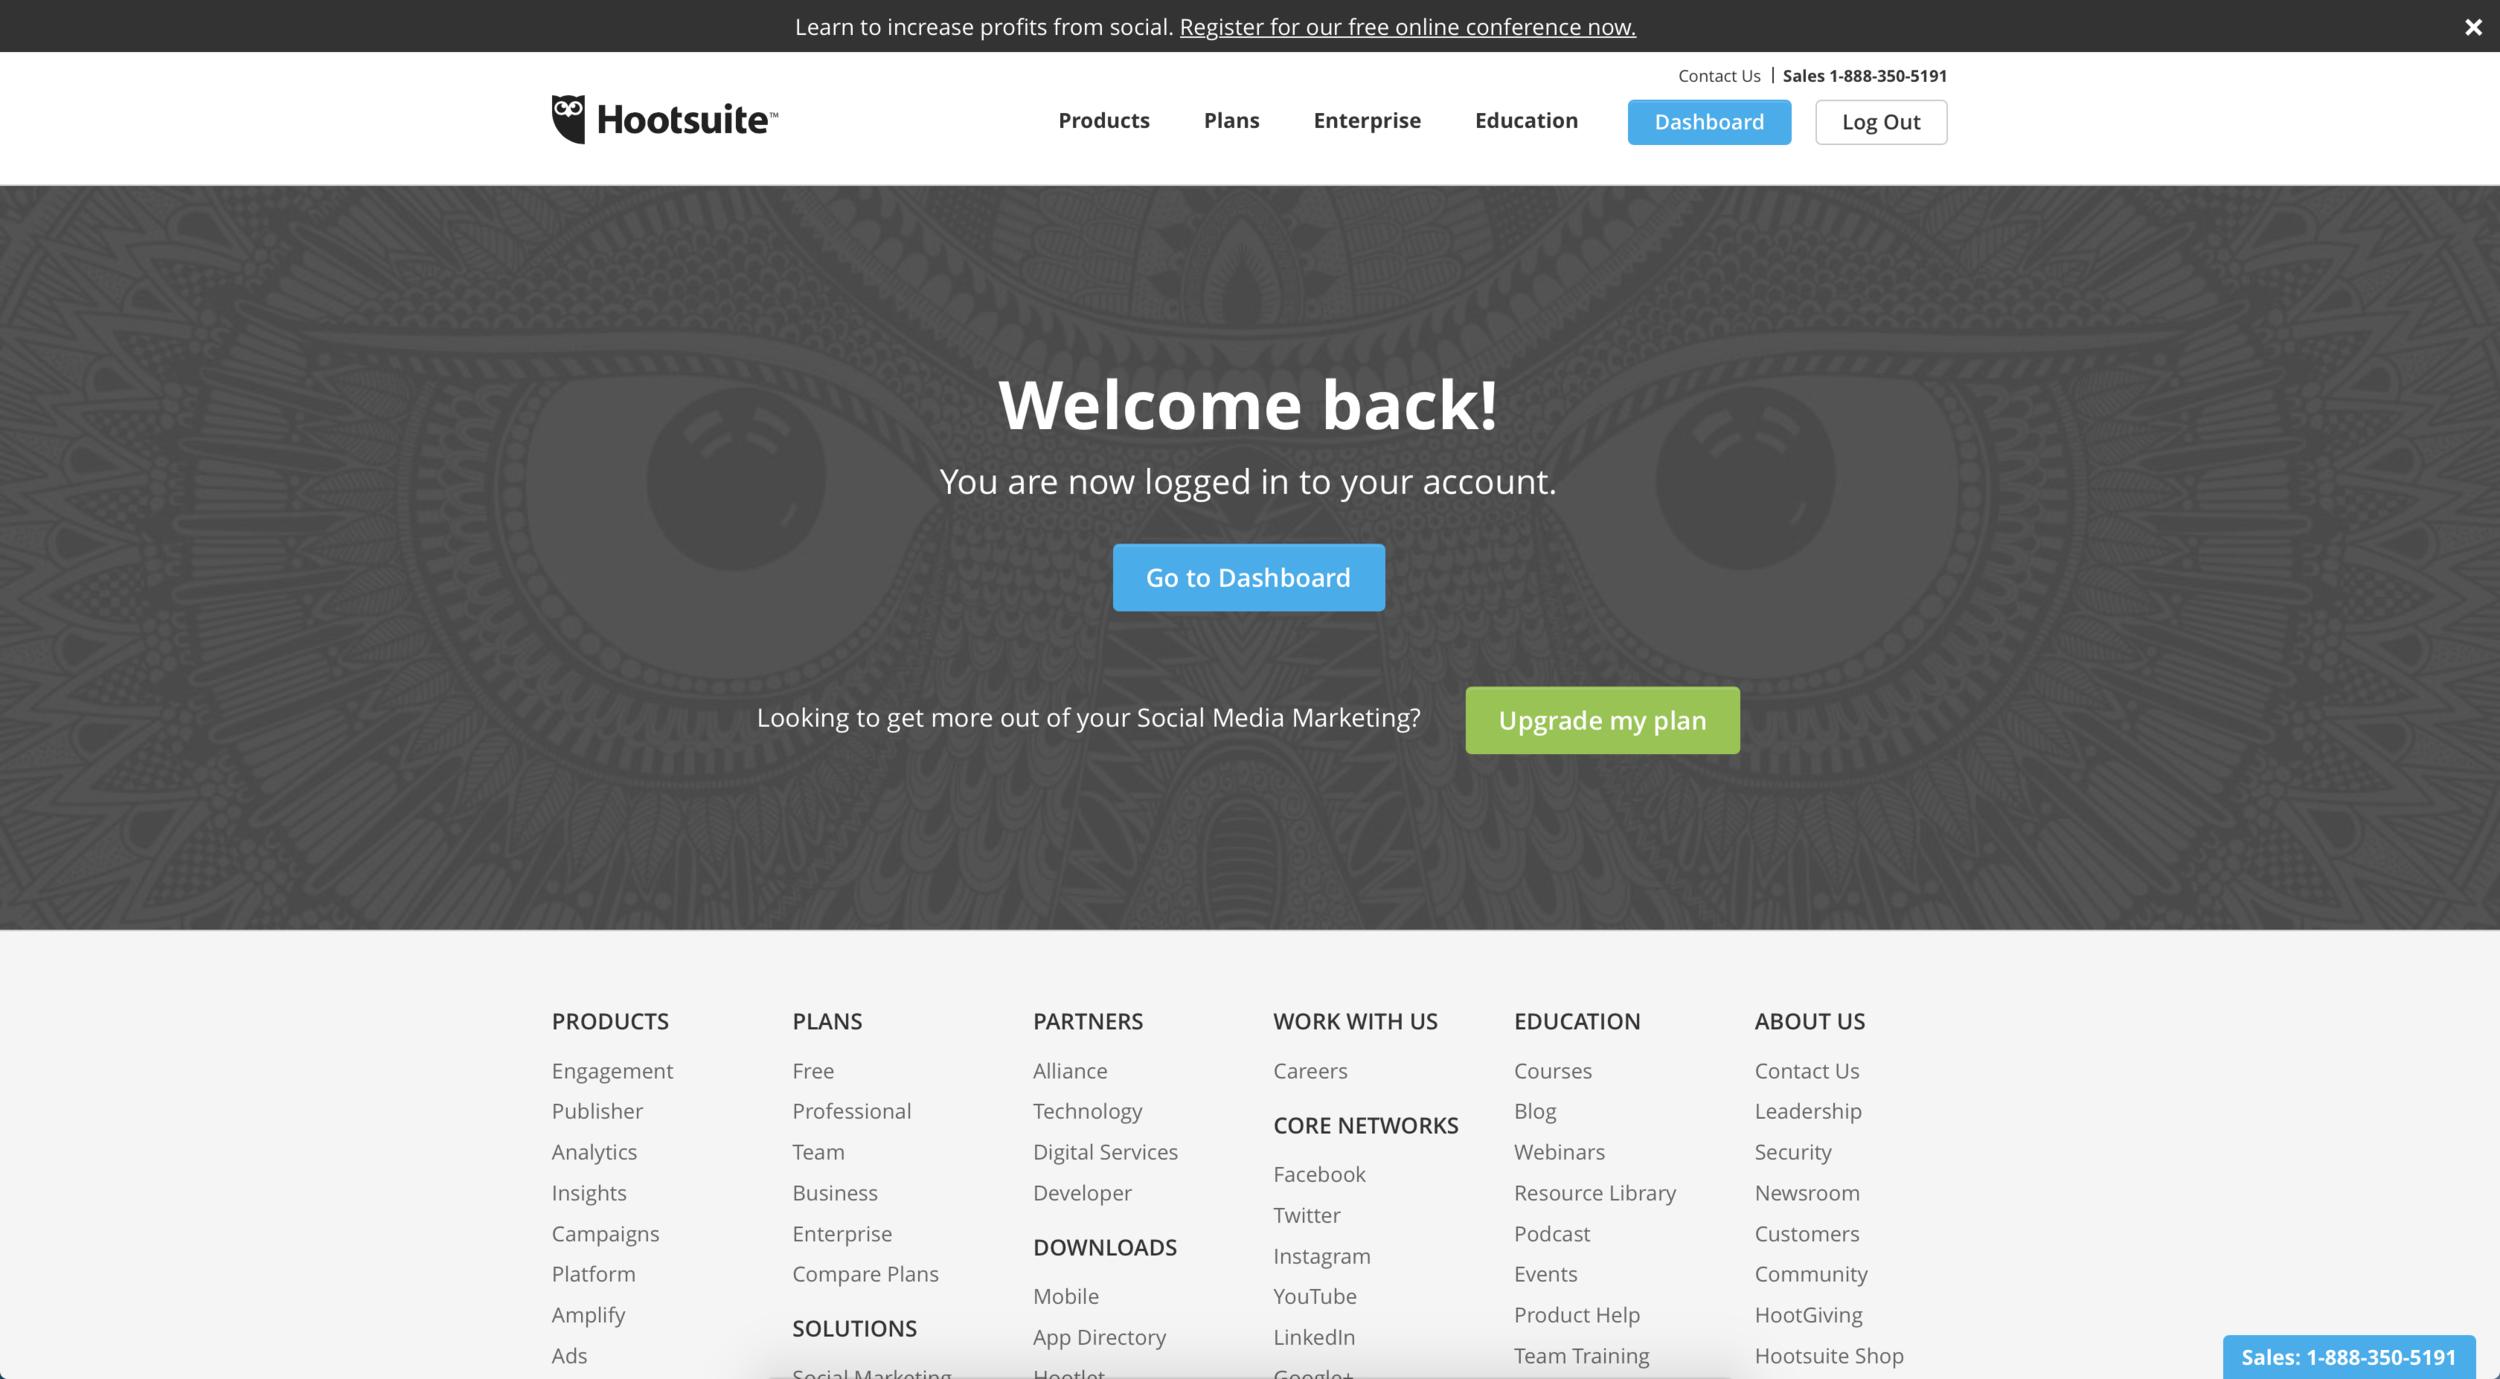 Hello-Mammoth-Blog-Marketing-Small-Business-Hootsuite-Social-Media